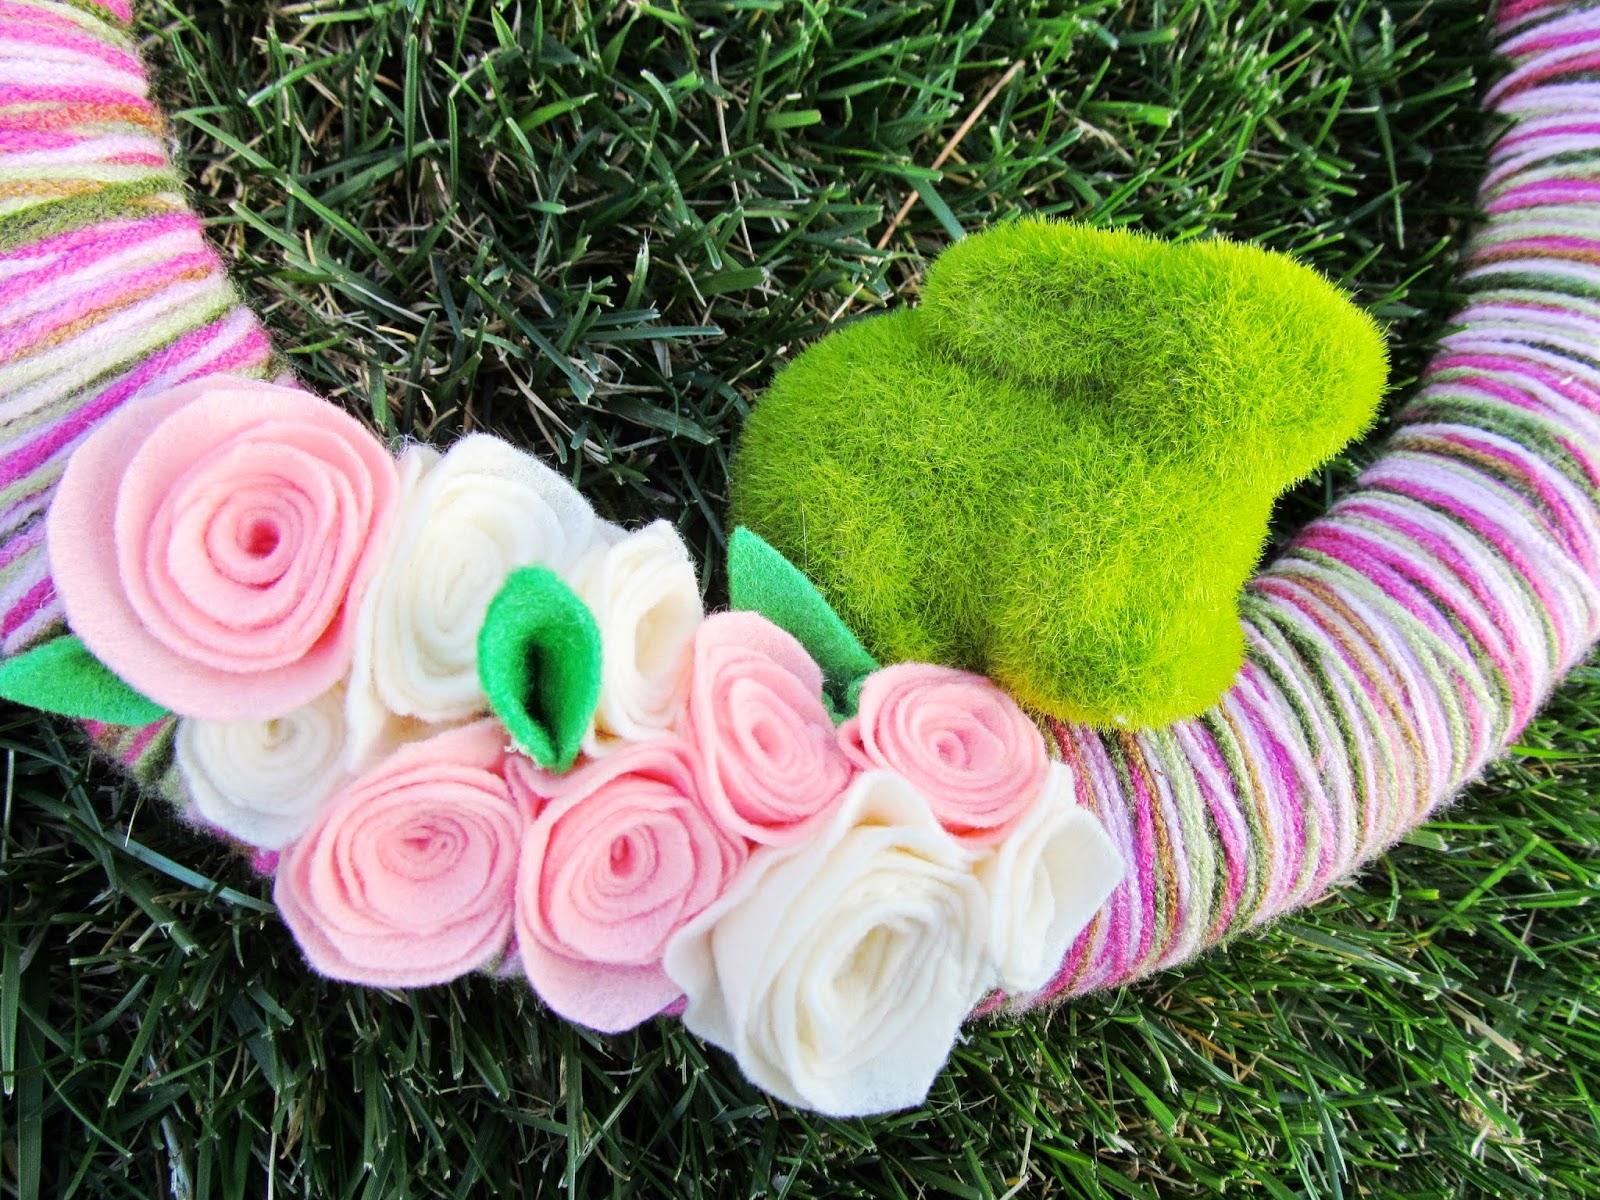 Cute little mossy bunny on a Spring wreath!